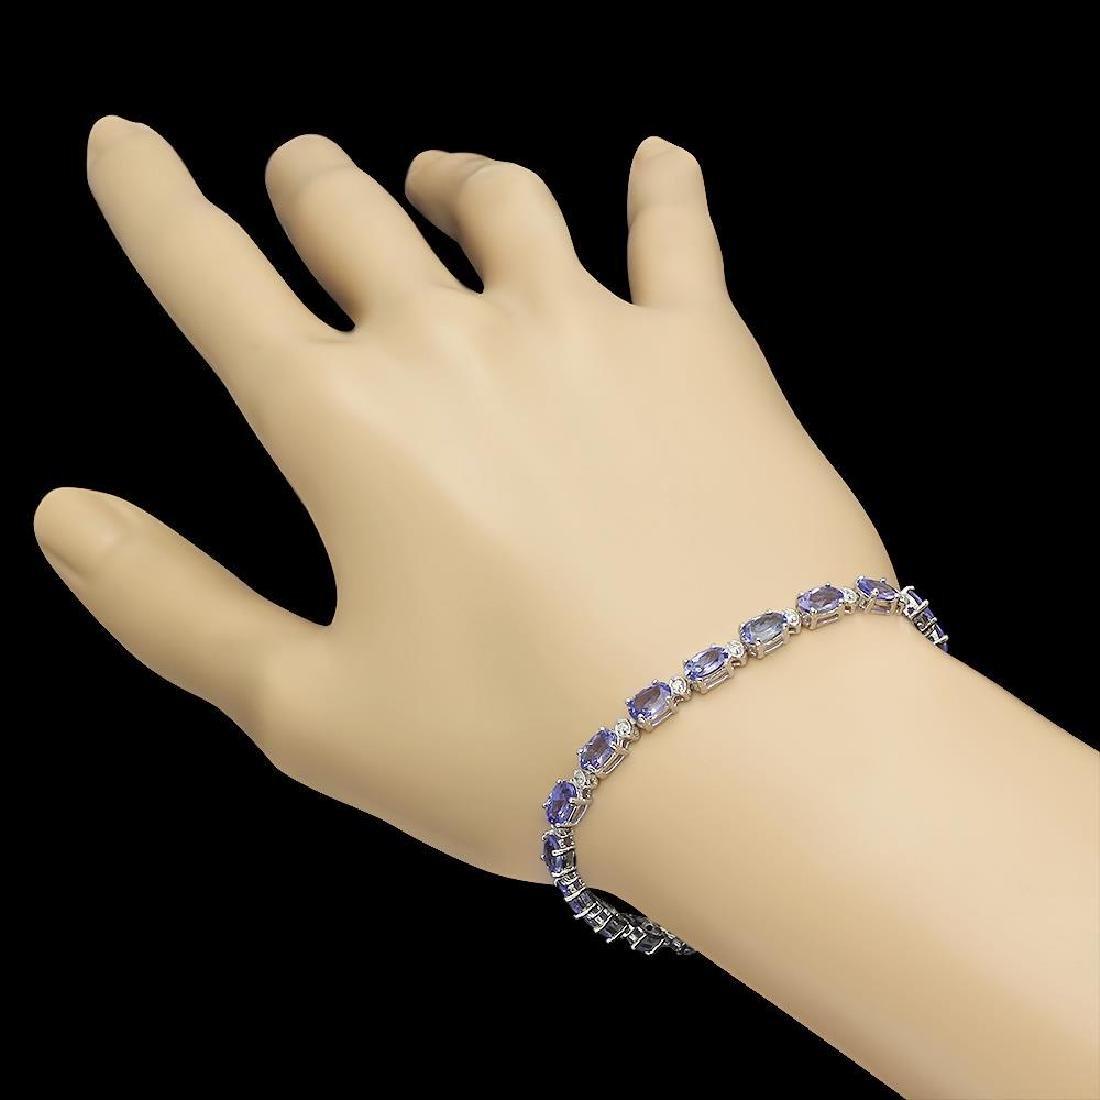 14K Gold 9.34ct Tanzanite 0.40ct Diamond Bracelet - 2